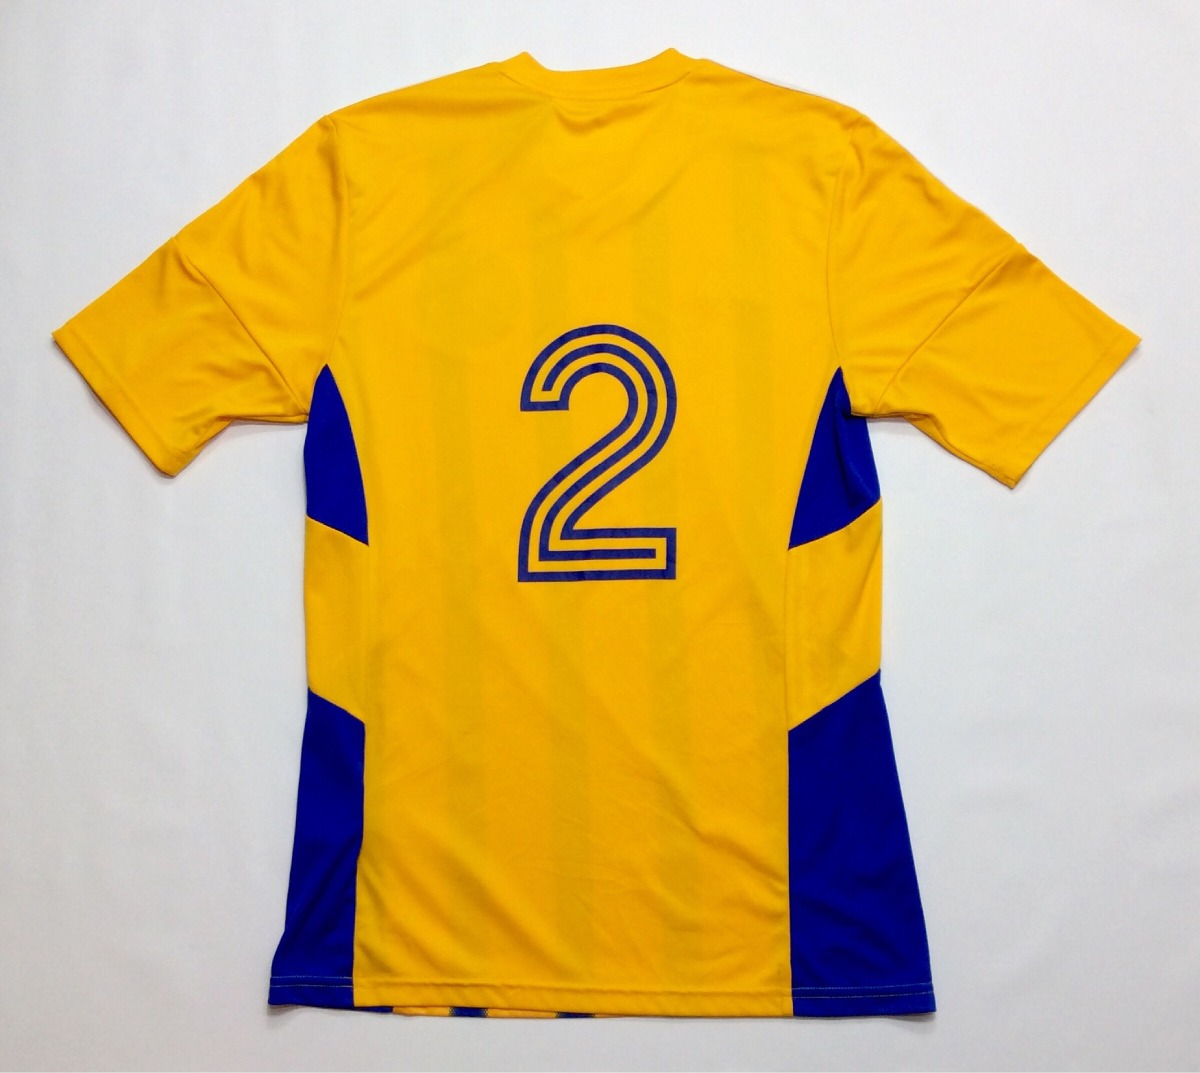 camiseta futbol adidas climalite pittsford mustangs 2 s. Cargando zoom. 38dc4331ba192